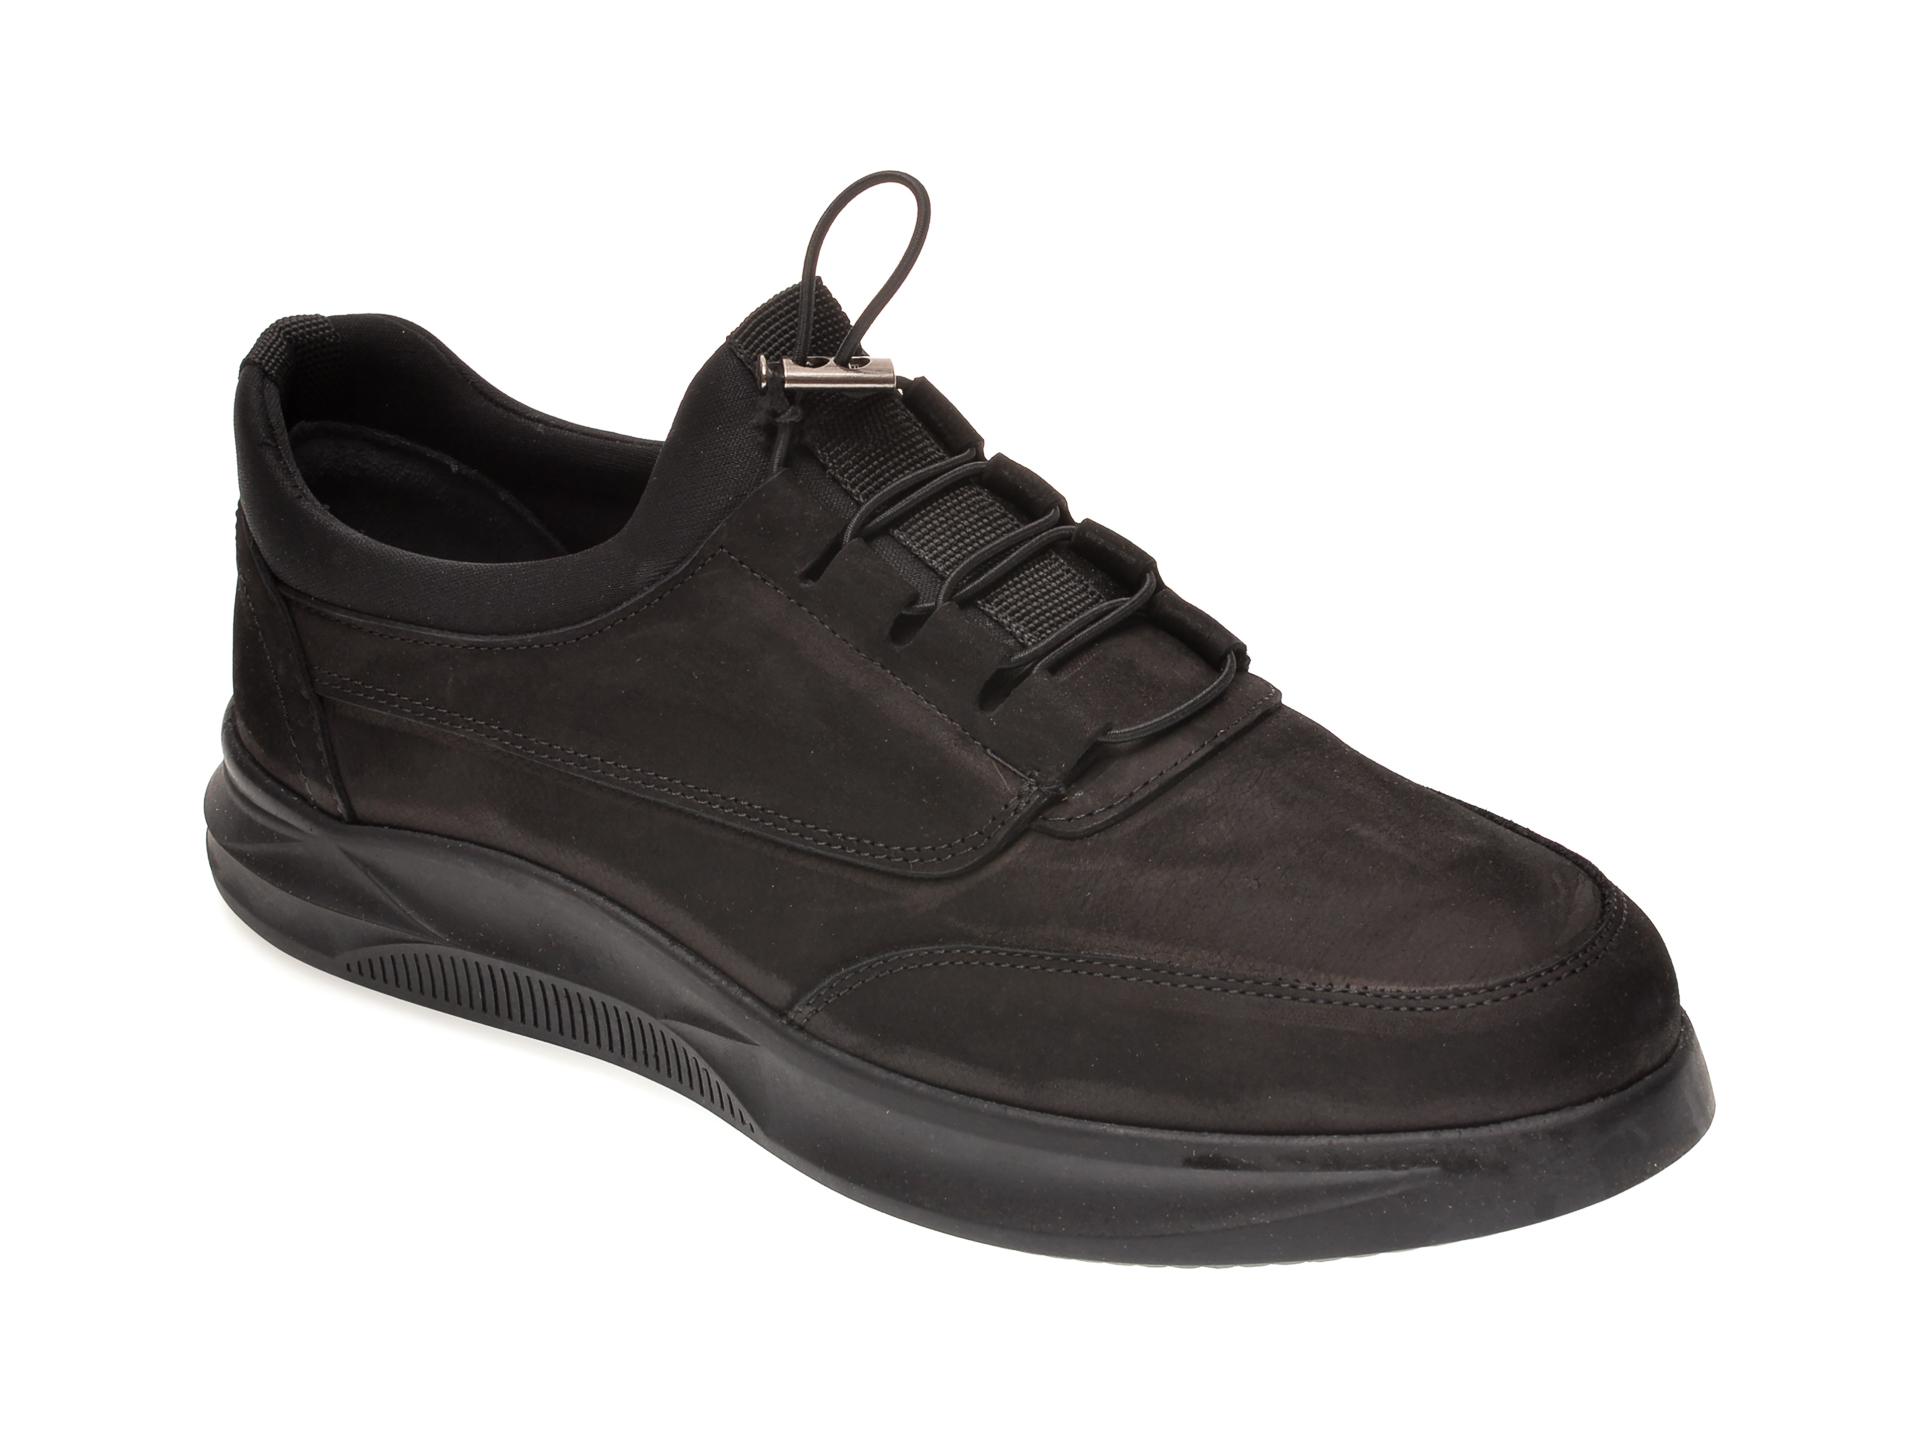 Pantofi OTTER negri, M5790, din nabuc imagine